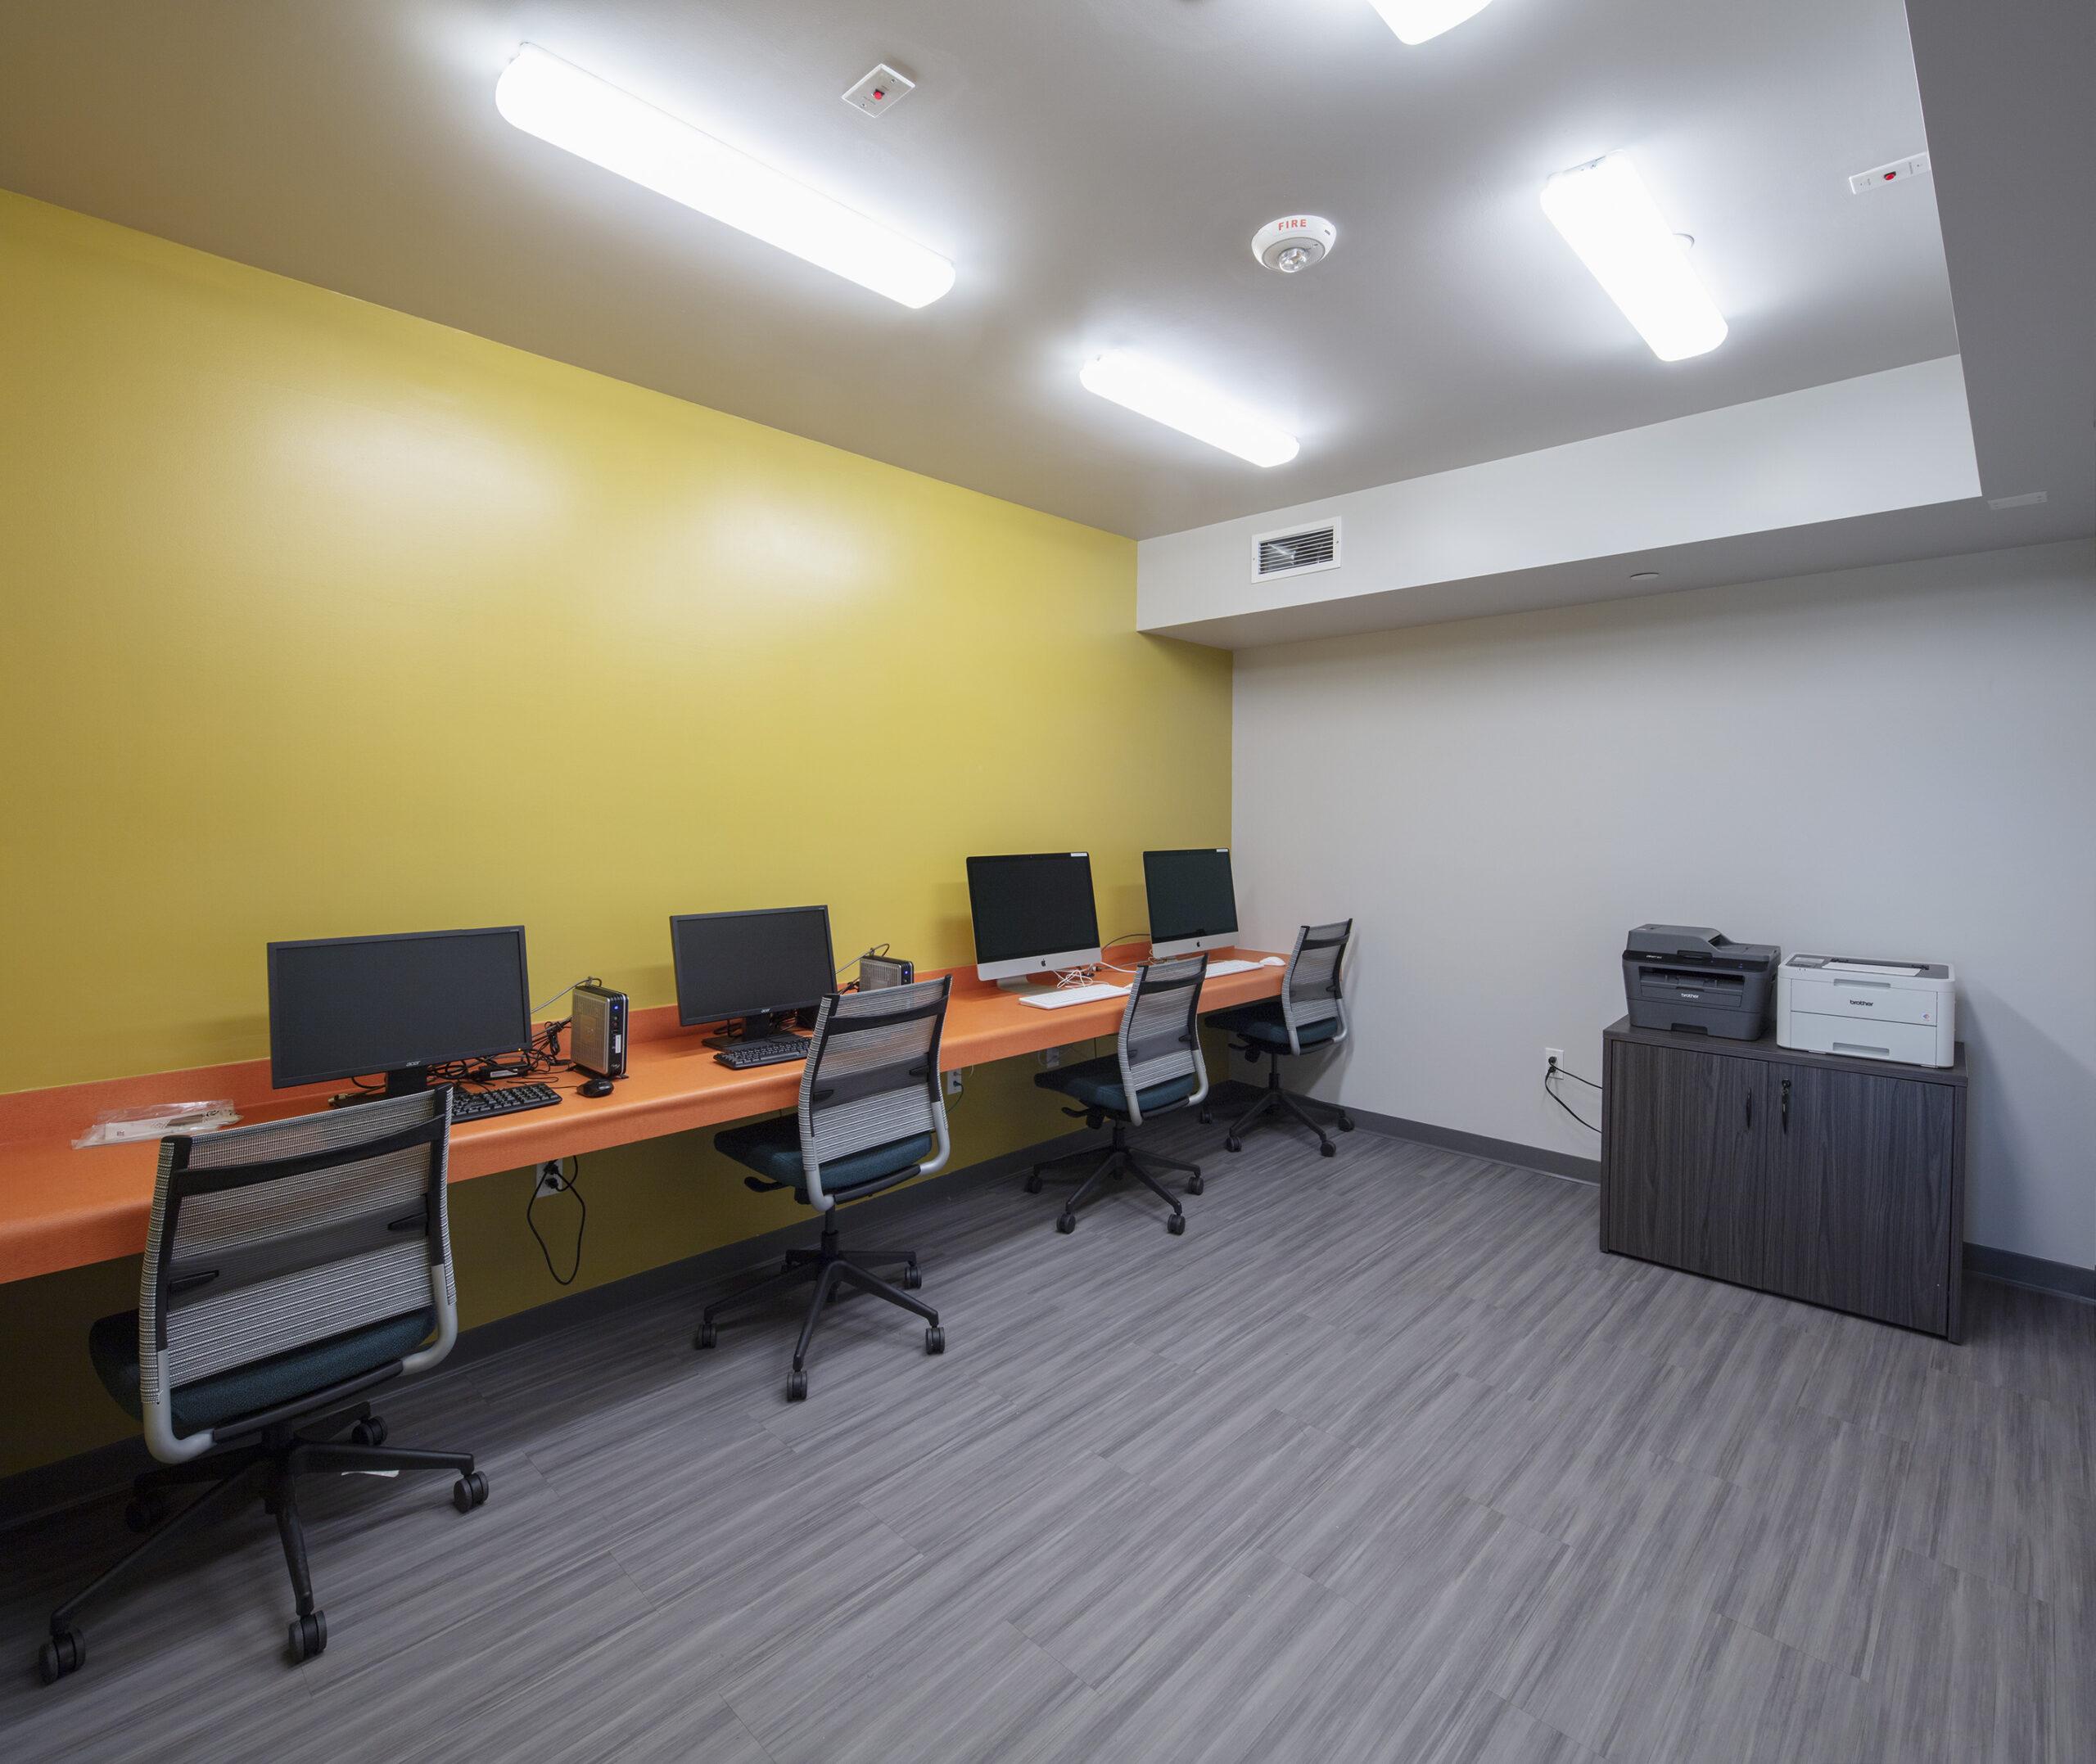 Carson arts apartment computer room